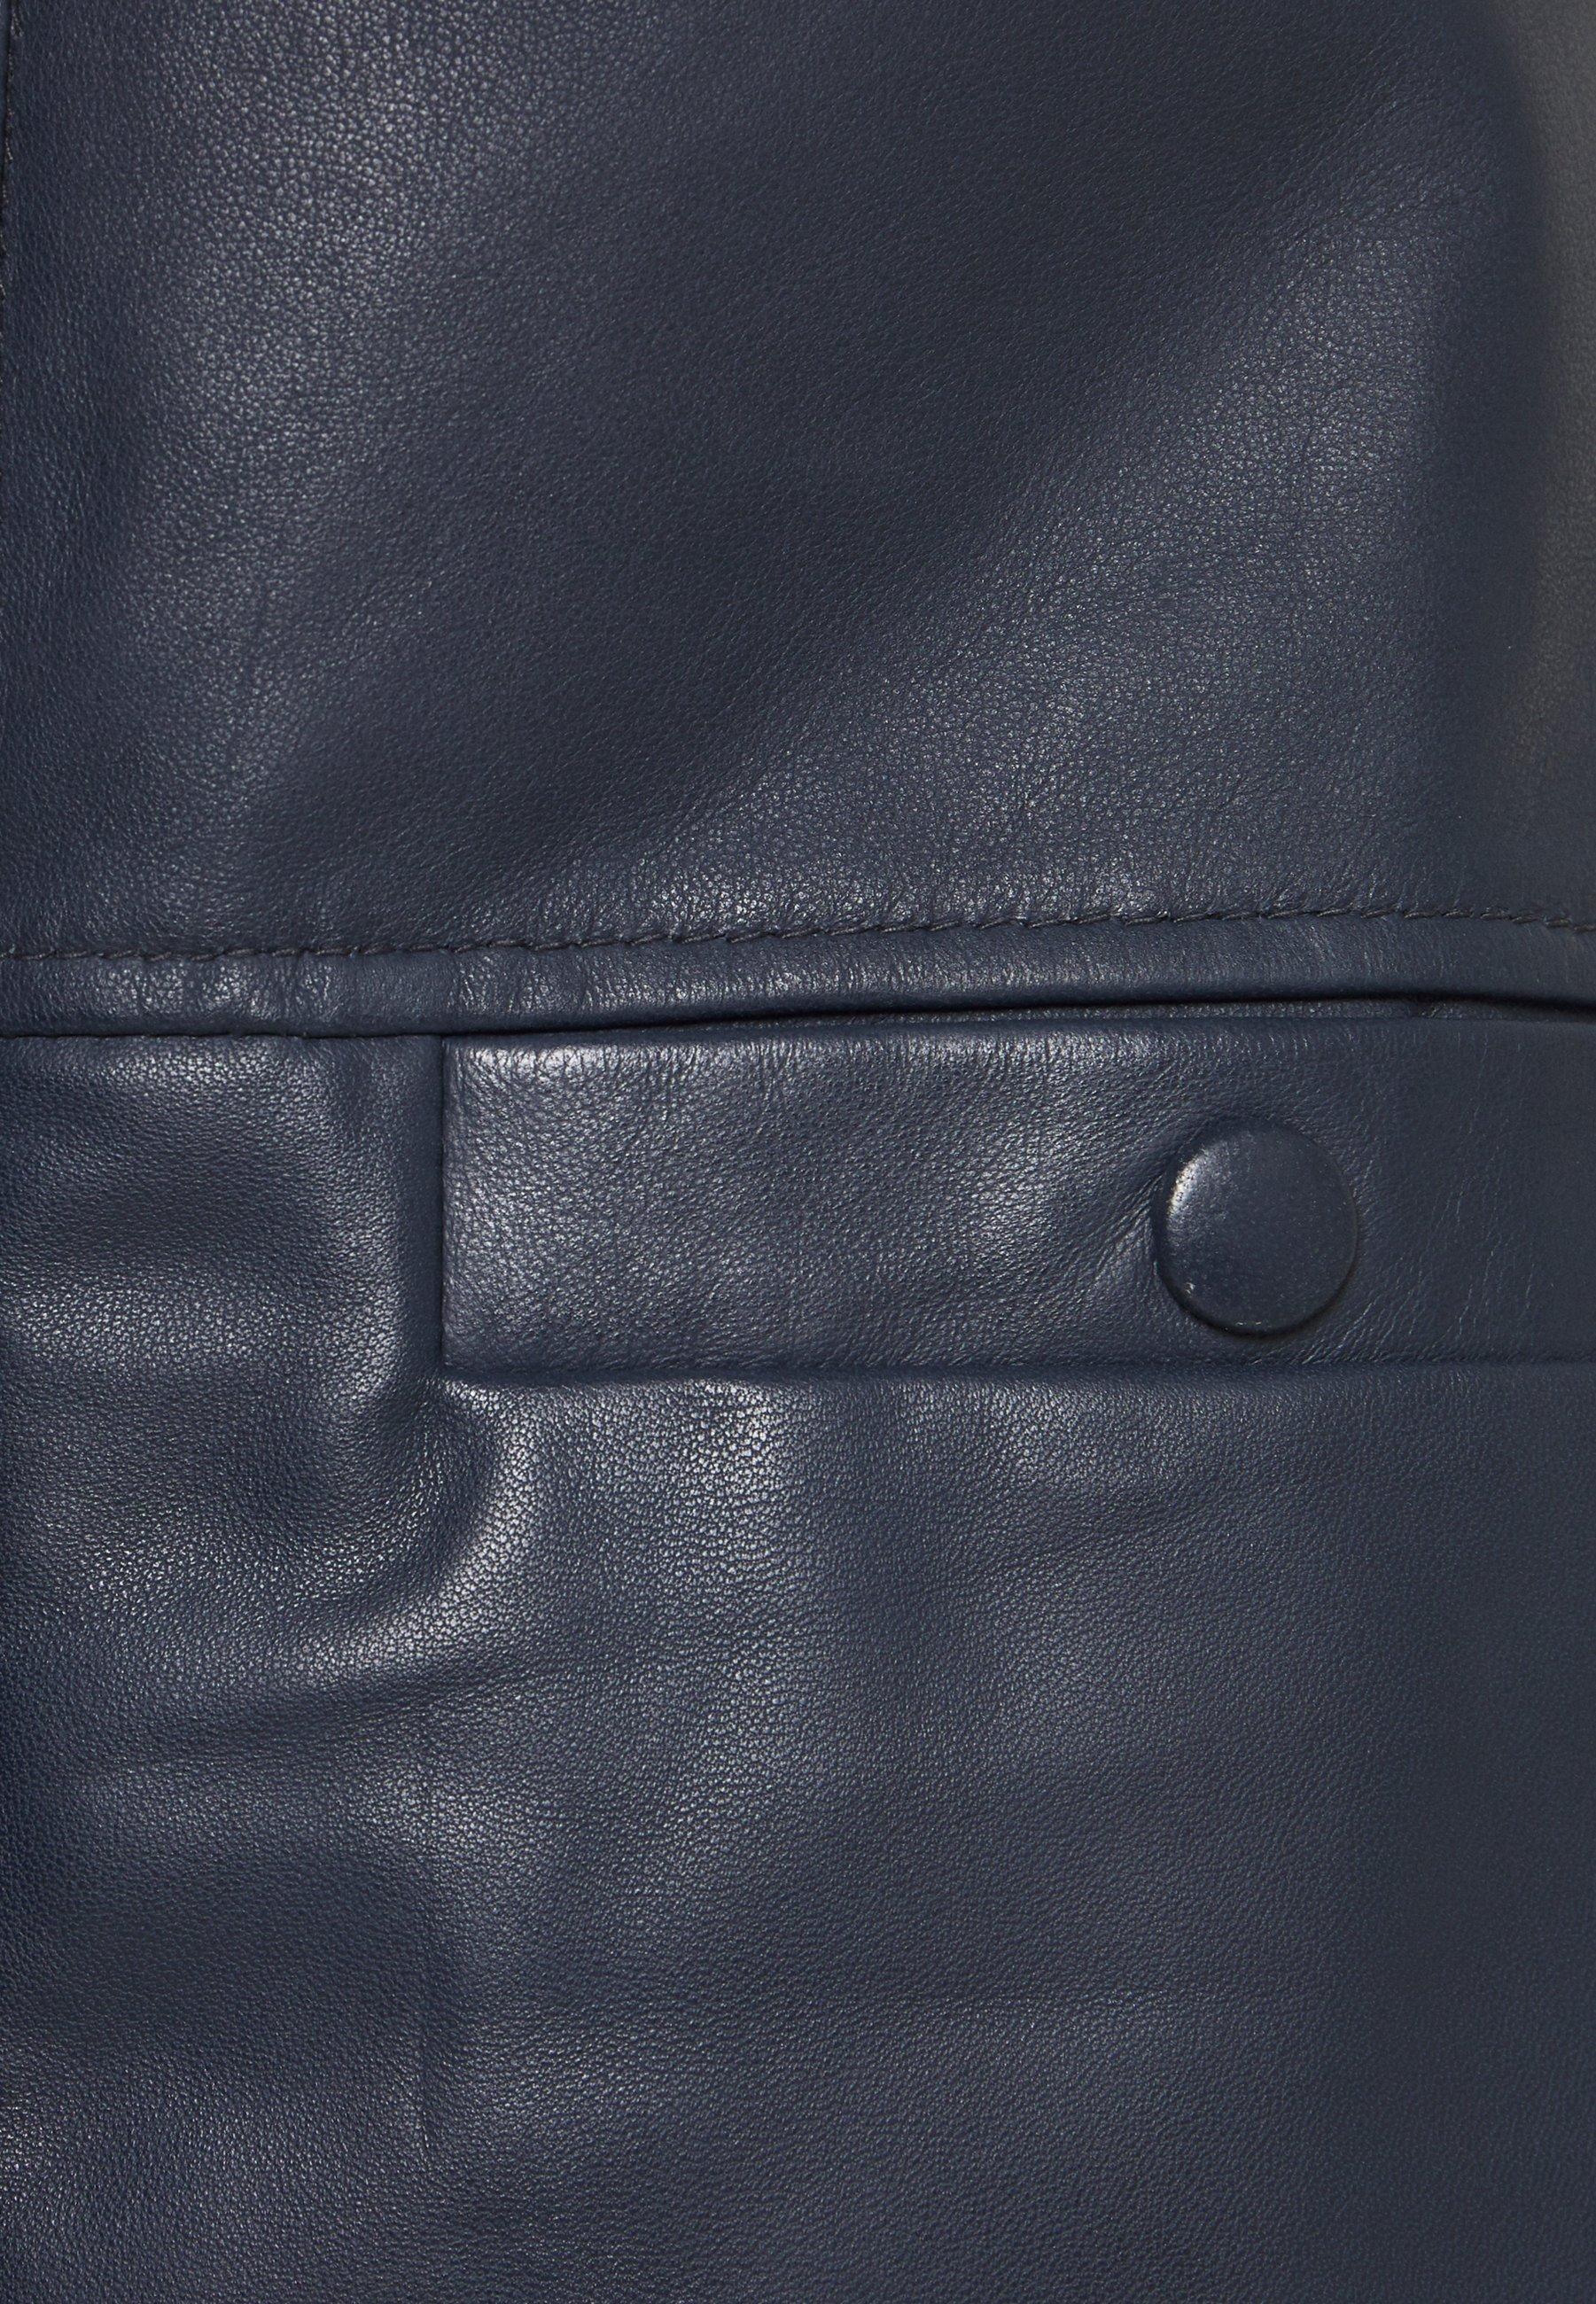 Ibana DENISE Blusenkleid dark navy/dunkelblau